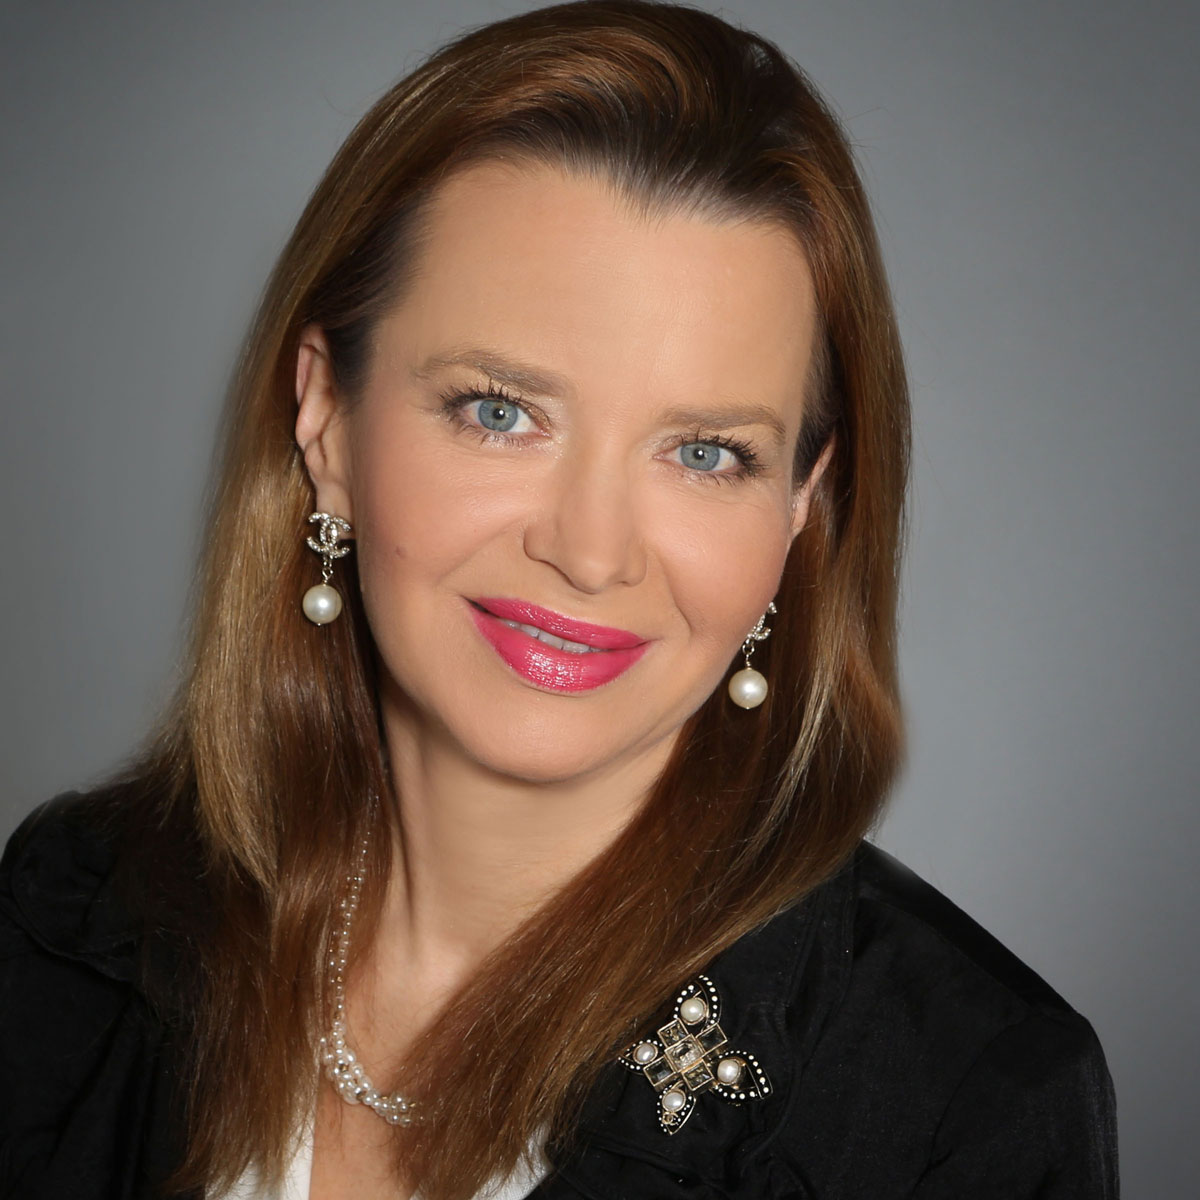 ludmila-golovine-ceo-president-founder-masterword.jpg